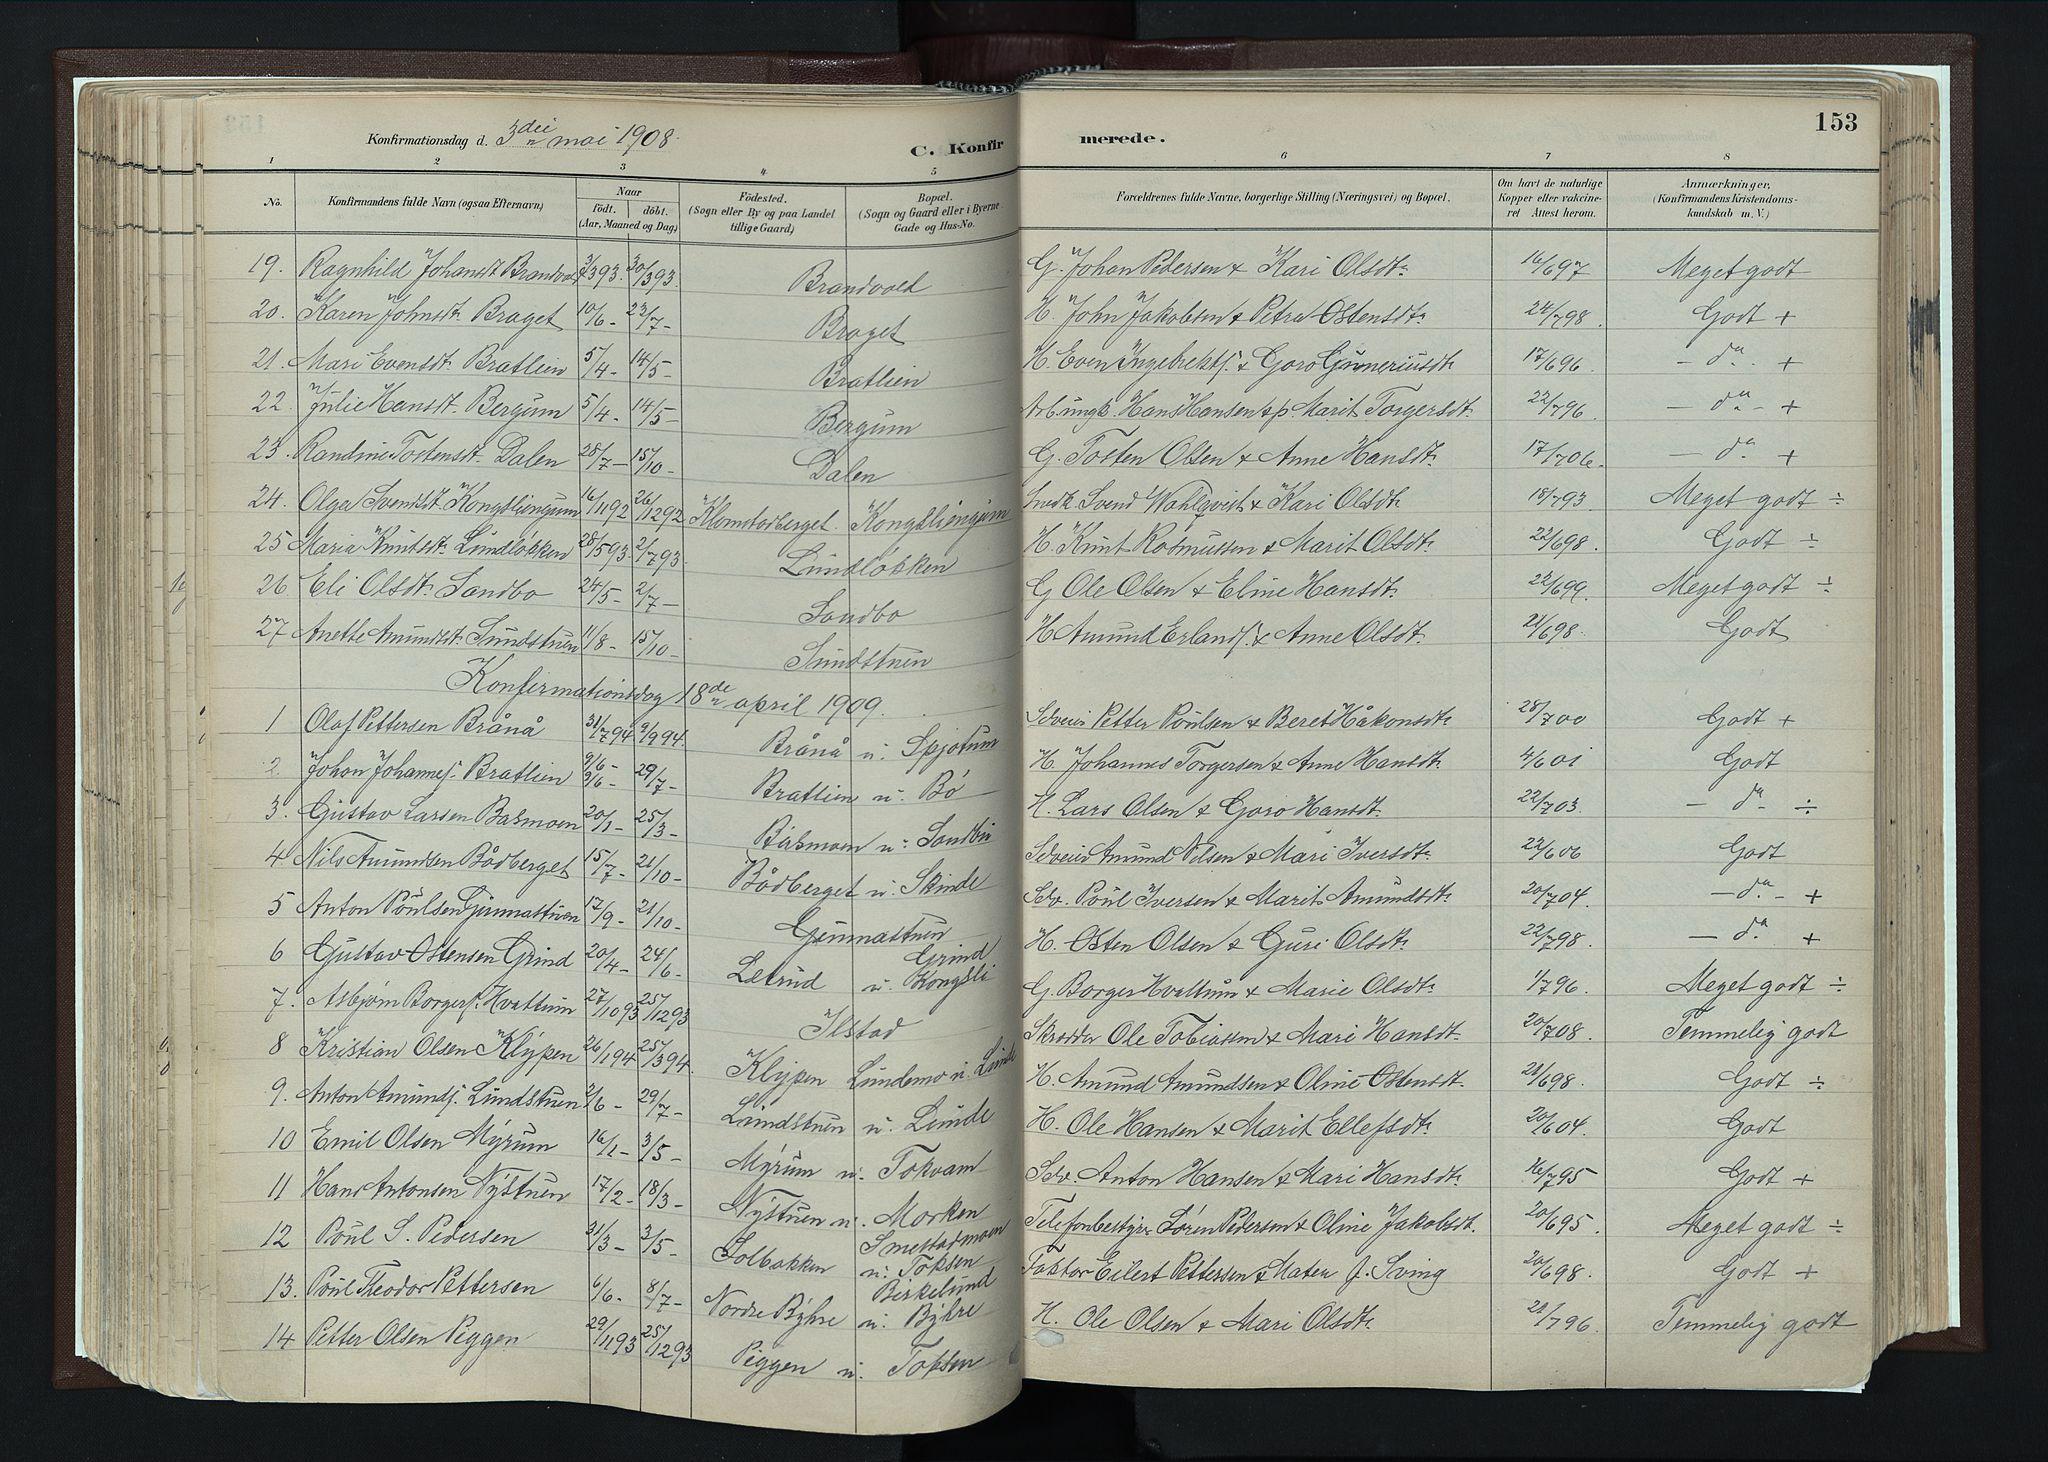 SAH, Nord-Fron prestekontor, Ministerialbok nr. 4, 1884-1914, s. 153